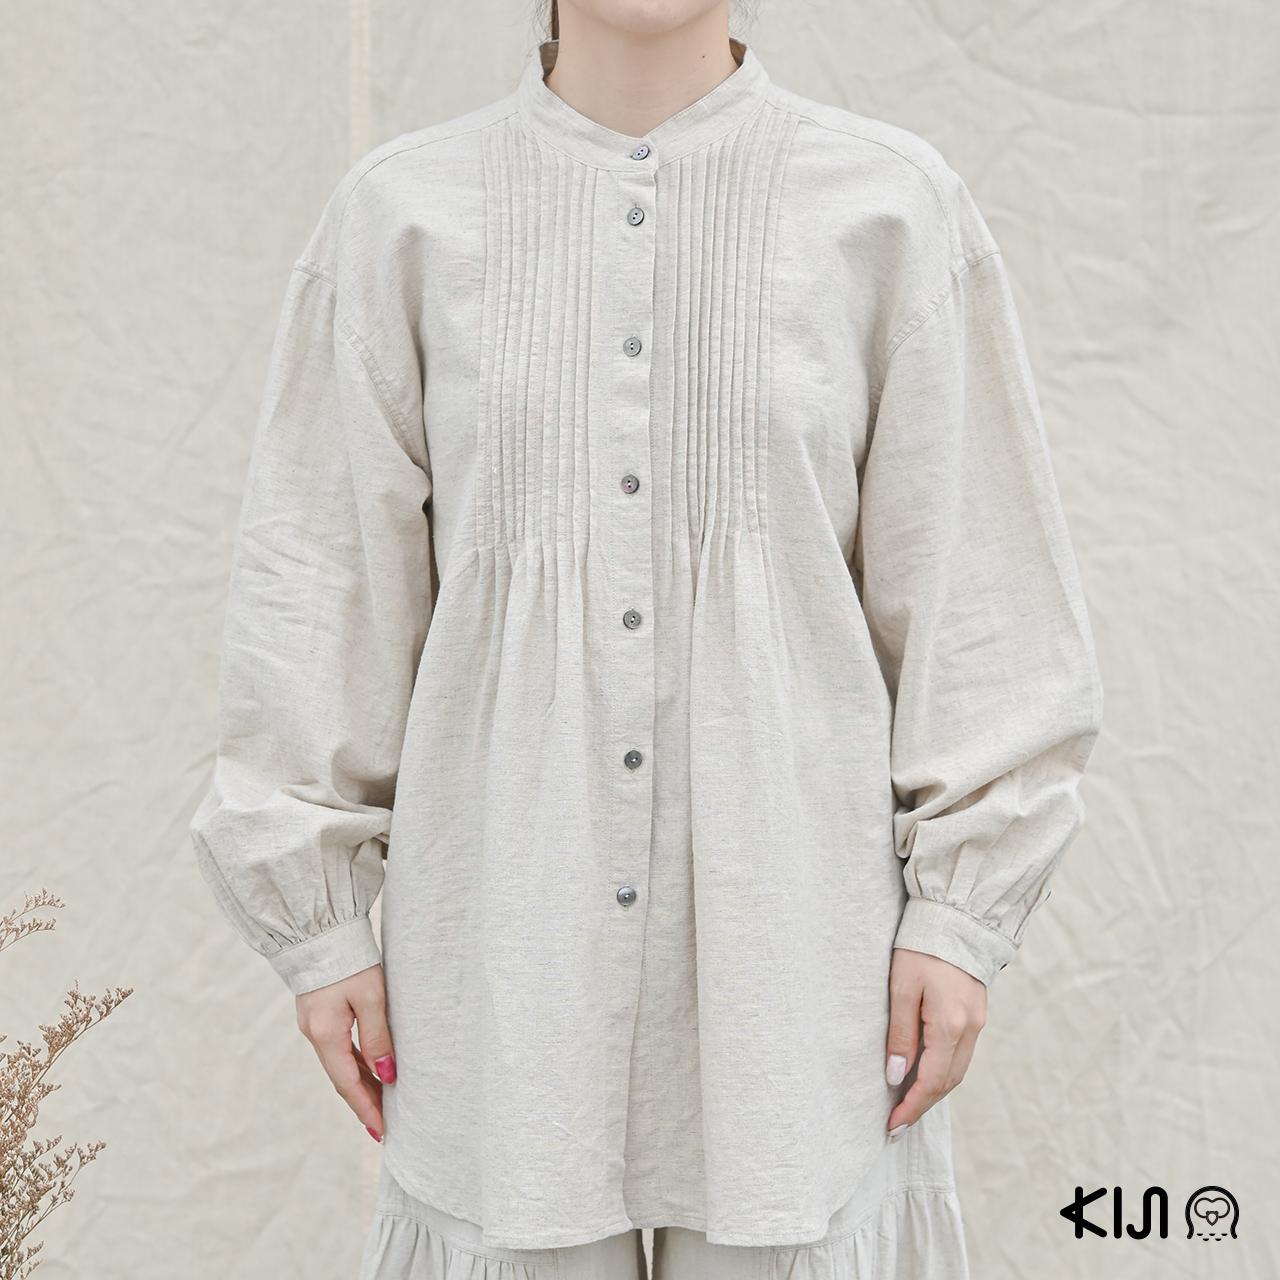 Pin Tack Shirt (4,600 บาท) เสื้อเชิ้ตดีไซน์เก๋ ผลิตจากใยกัญชง 100% จากแบรนด์ planeta ORGANICA